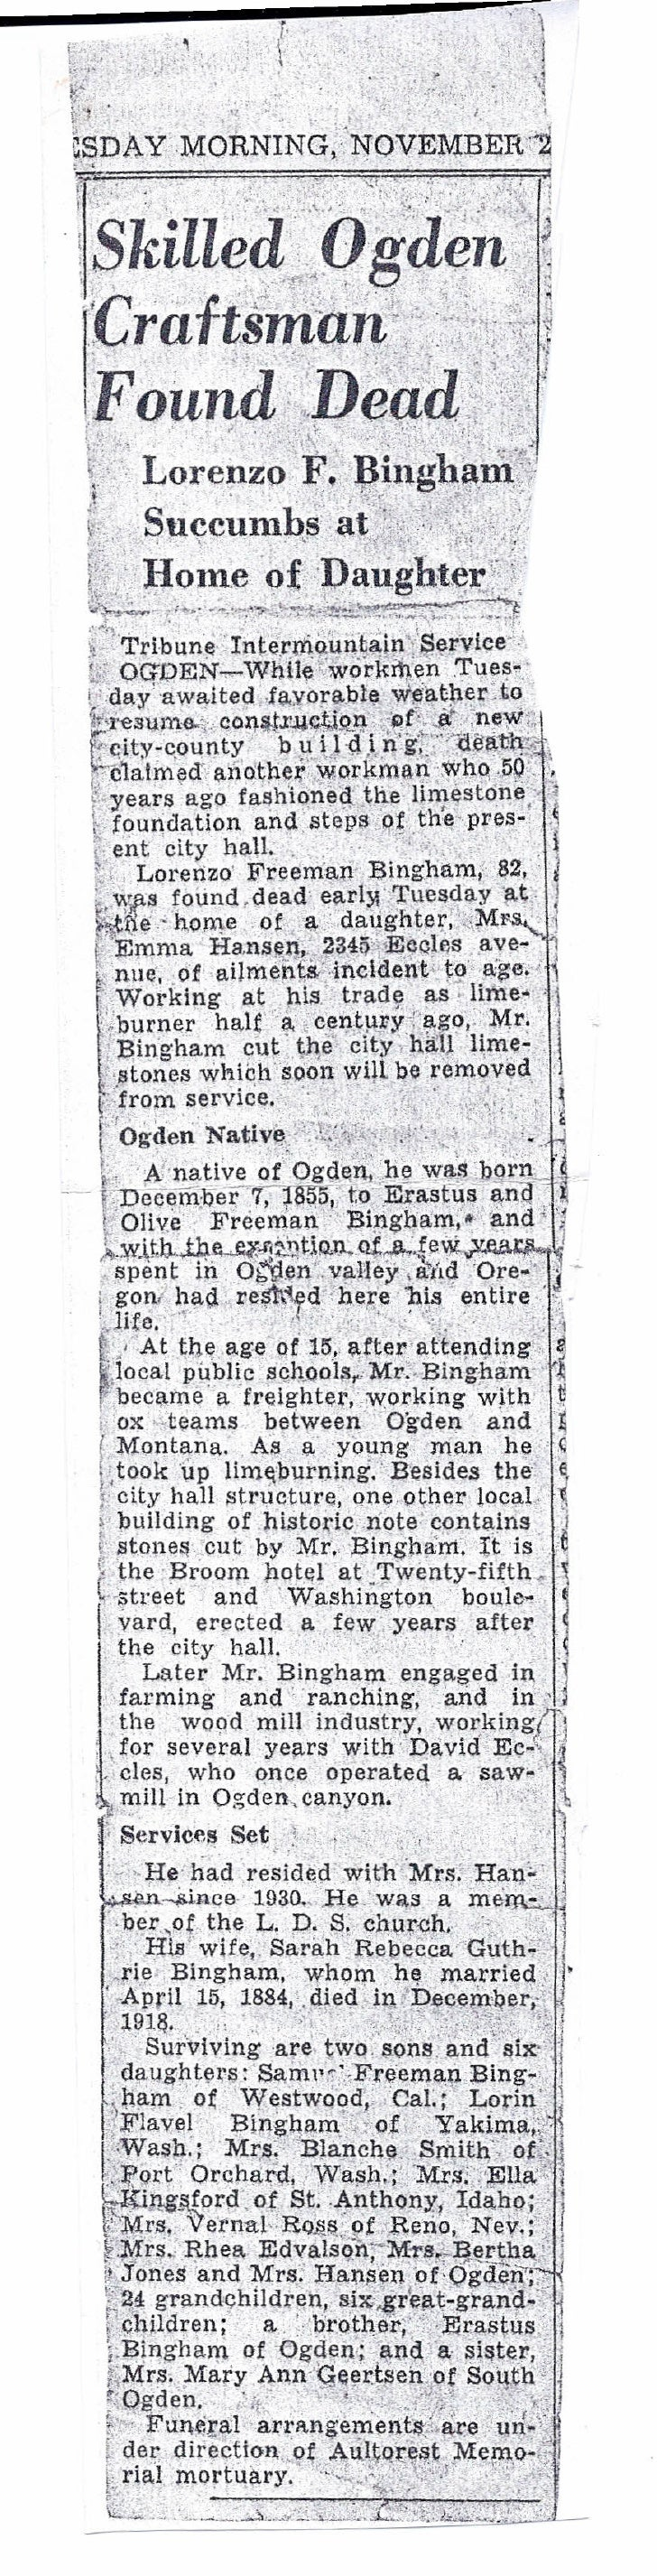 Lorenzo Freeman Bingham Obituary